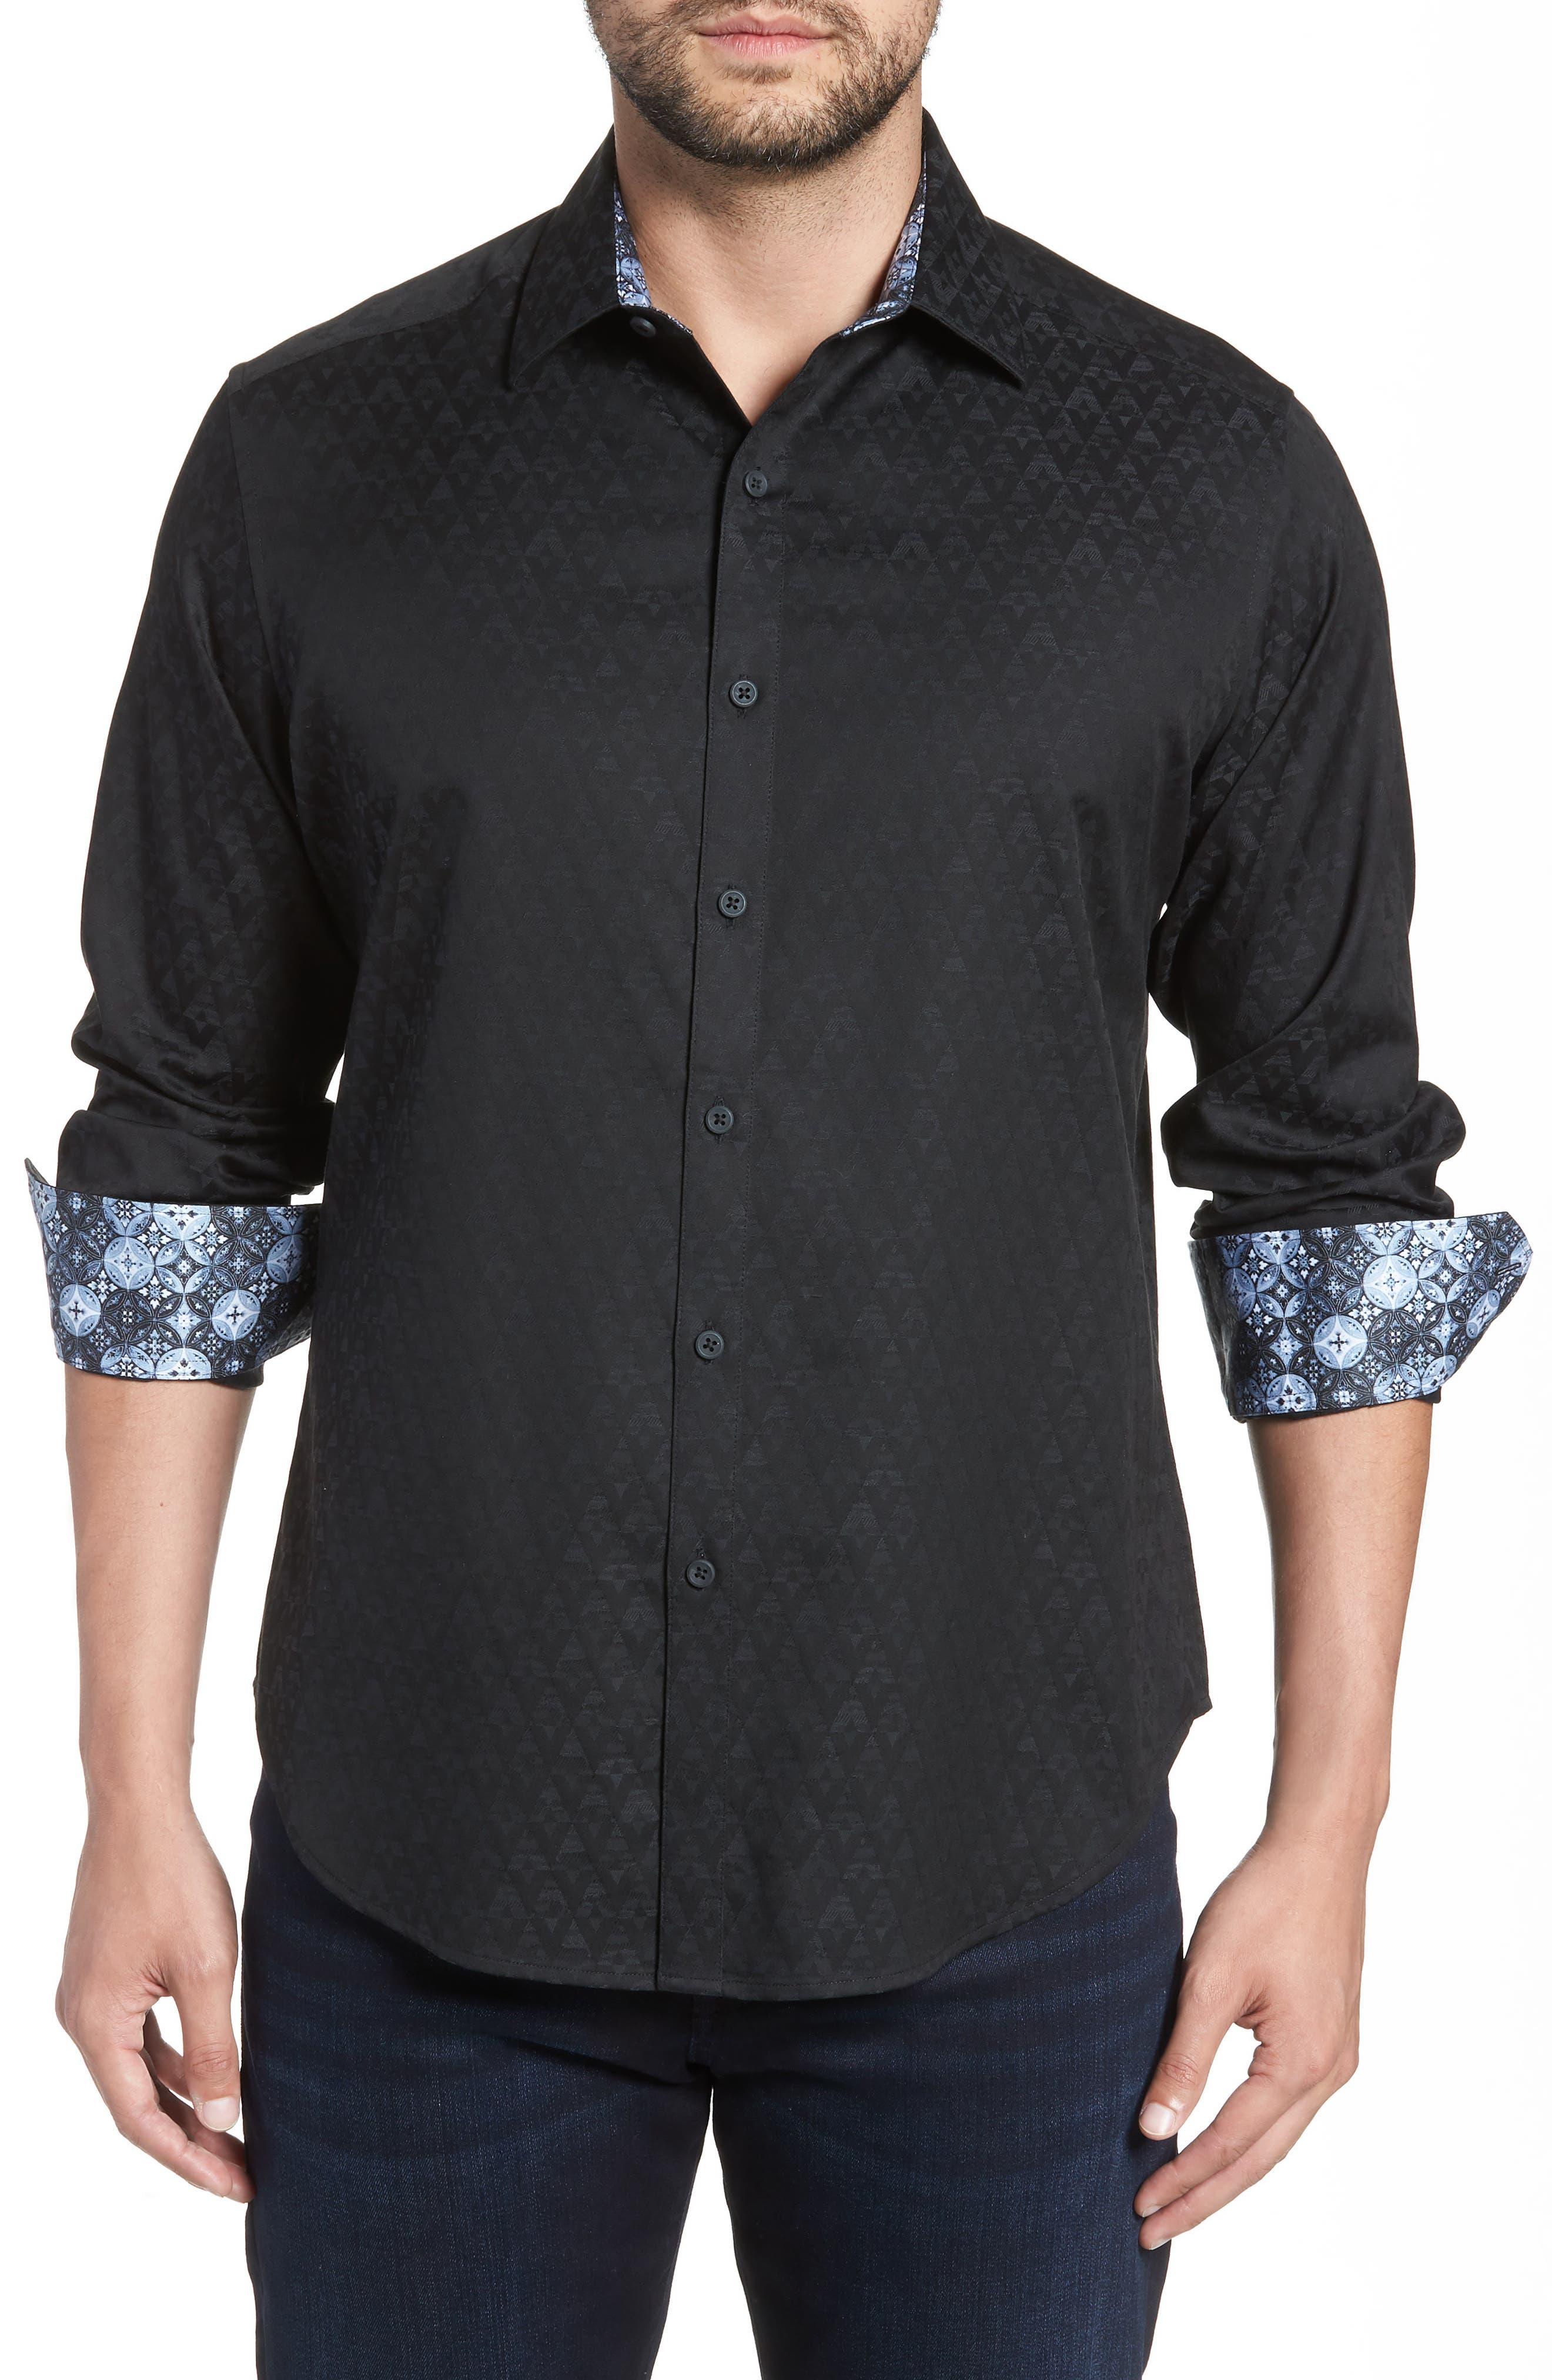 ROBERT GRAHAM, Classic Fit Stretch Geometric Sport Shirt, Main thumbnail 1, color, BLACK